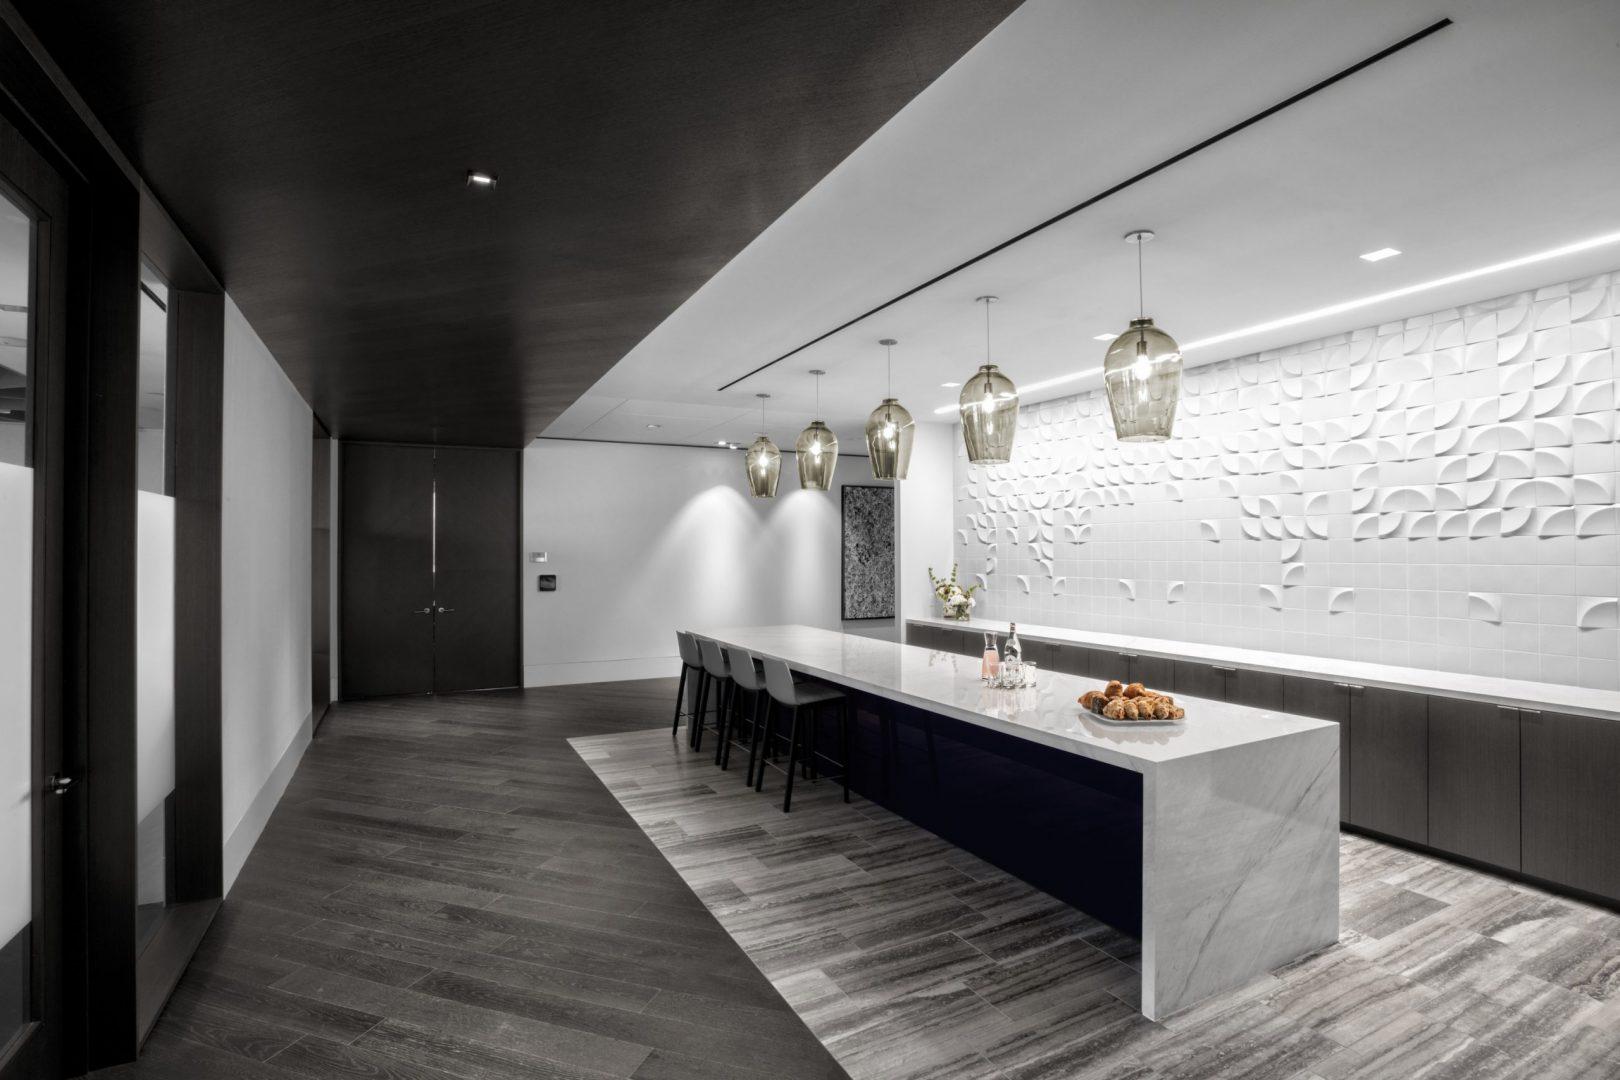 Corporate Interior Design Lockton Houston Breakroom Island White Backsplash